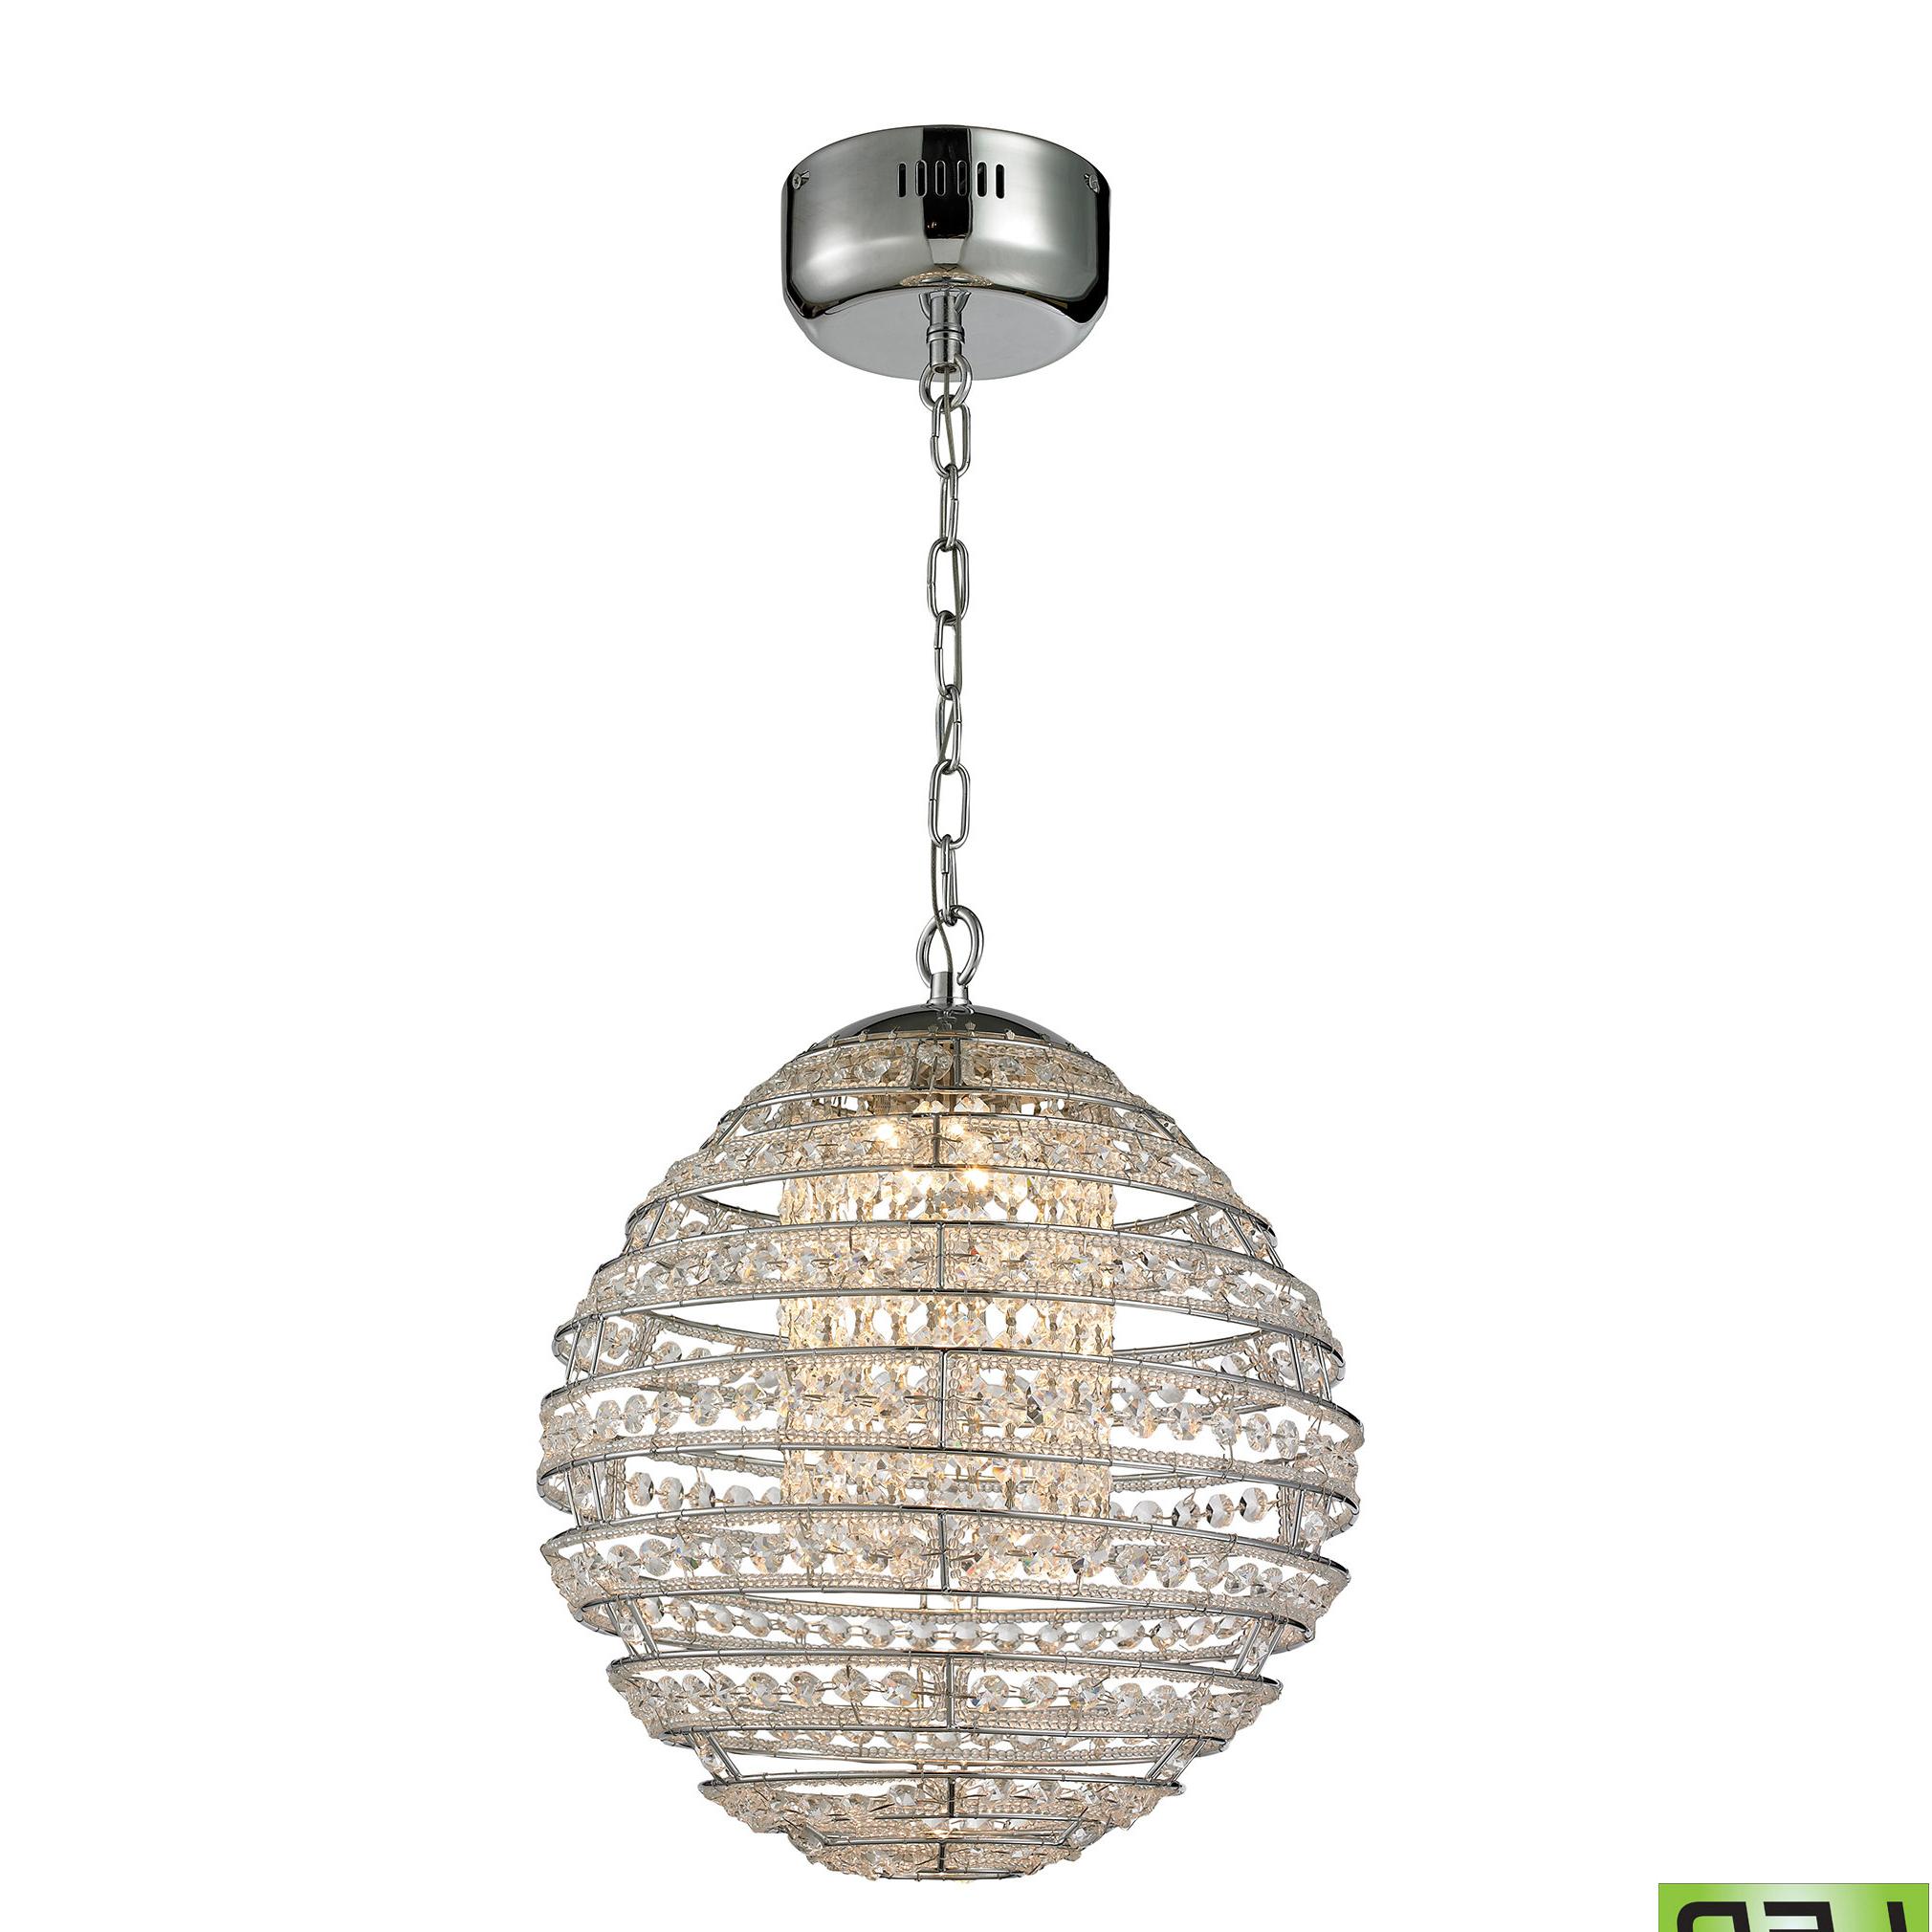 Tussey 1 Light Led Single Globe Pendant For Latest Spokane 1 Light Single Urn Pendants (View 23 of 25)